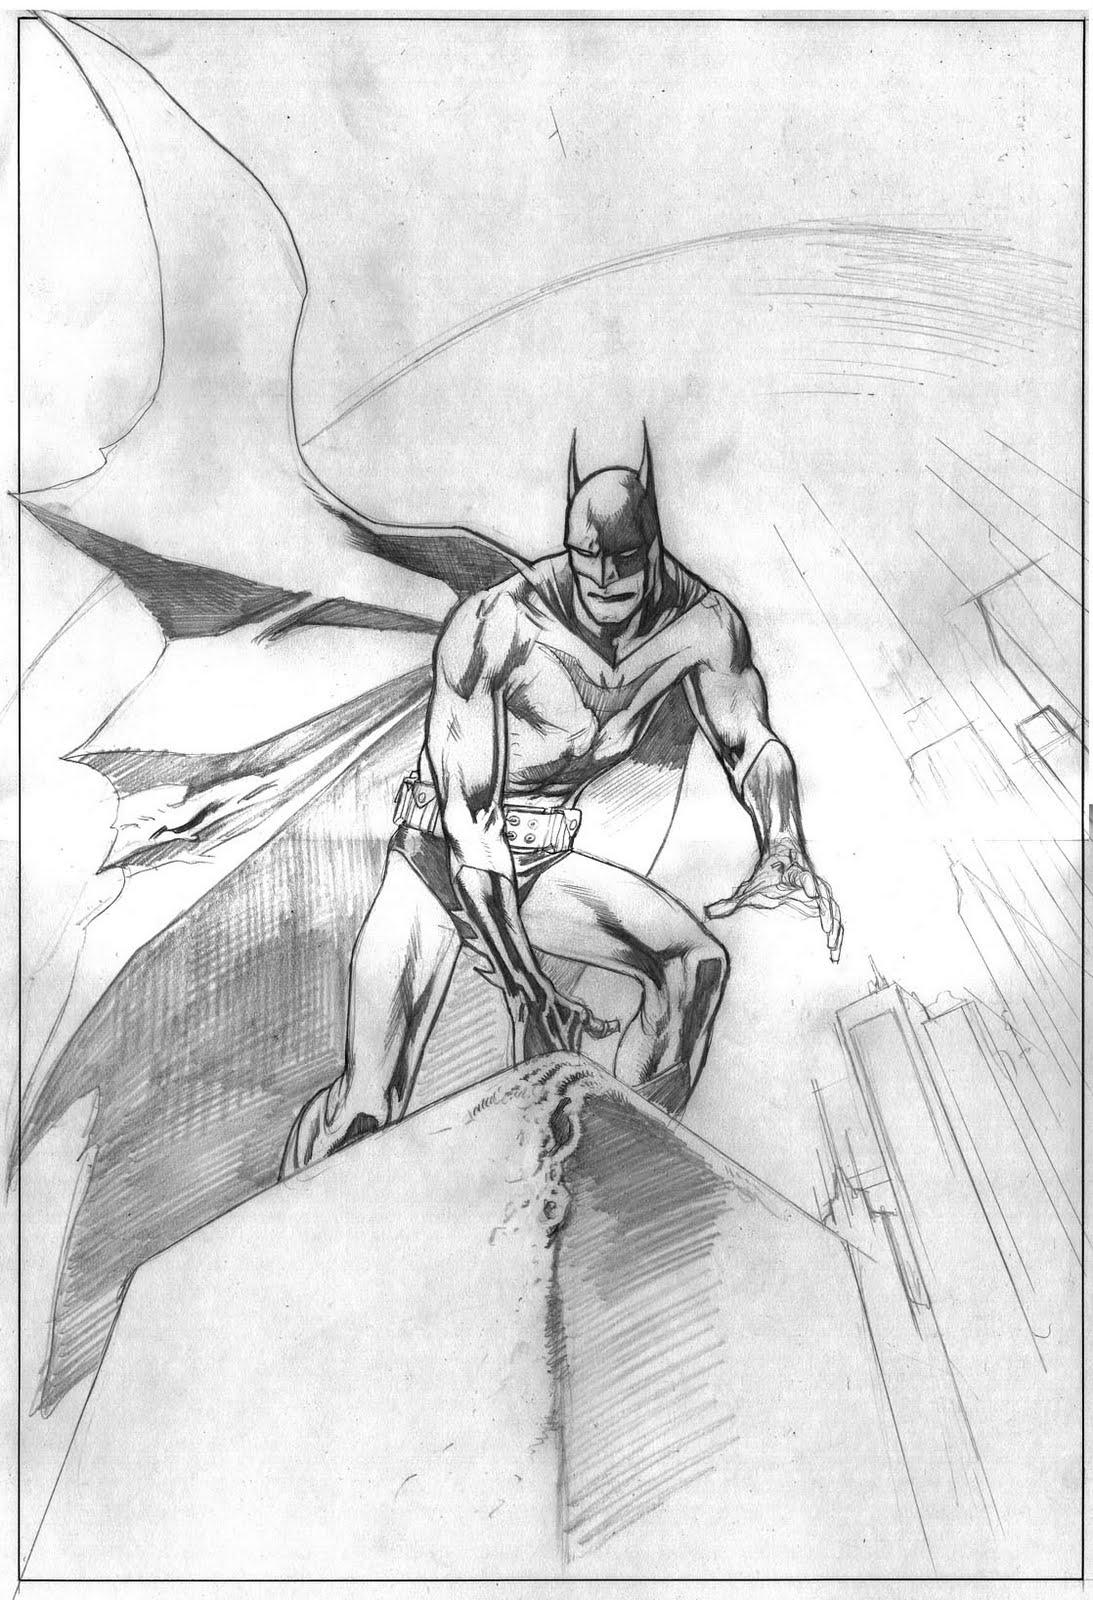 Kevin Nowlan: Batman gargoyle drawing #3